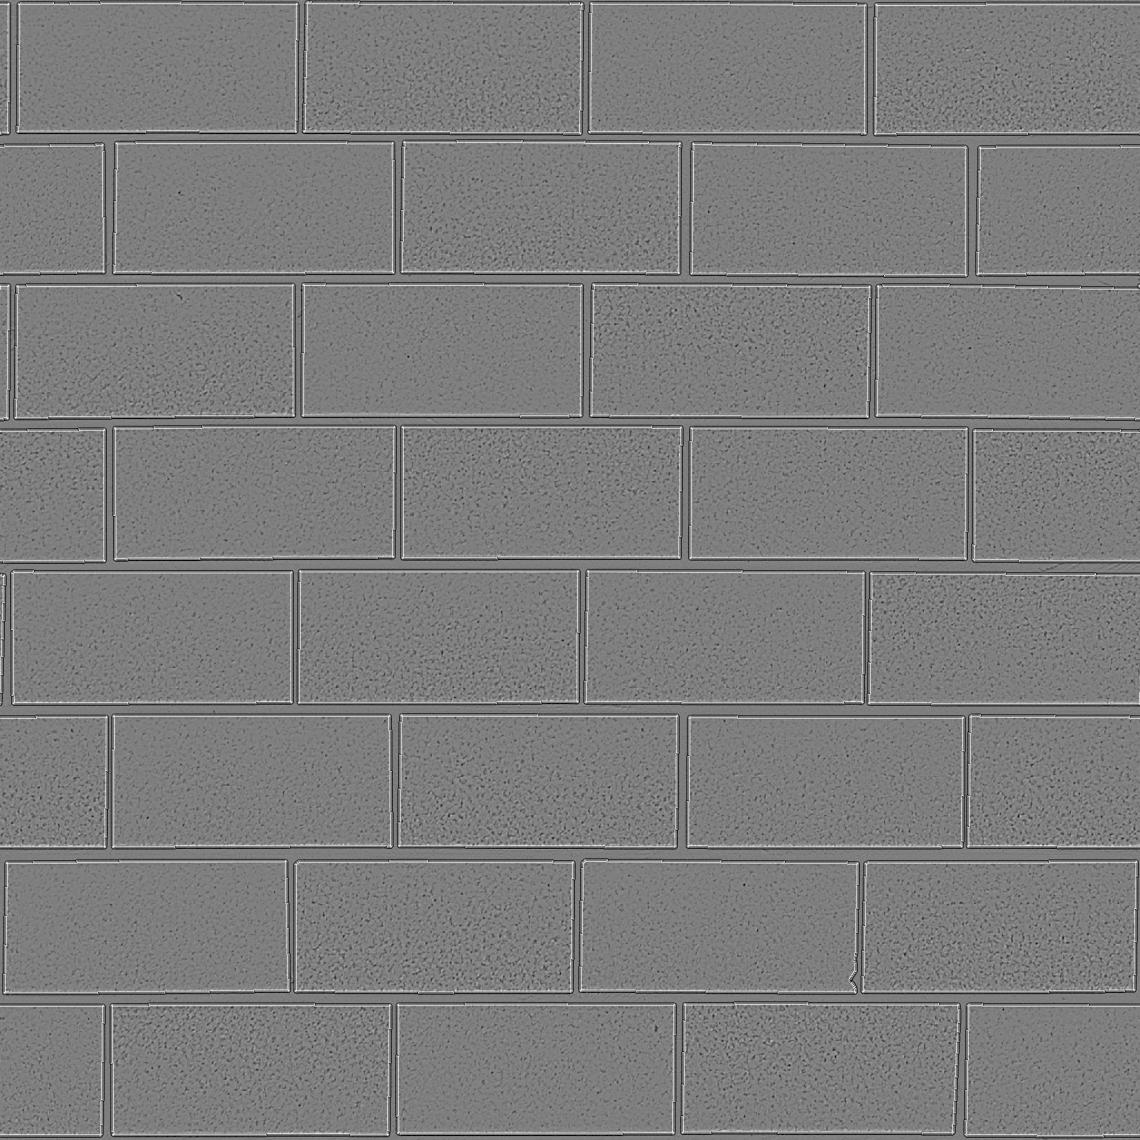 Simple-Tiles-06-Curvature